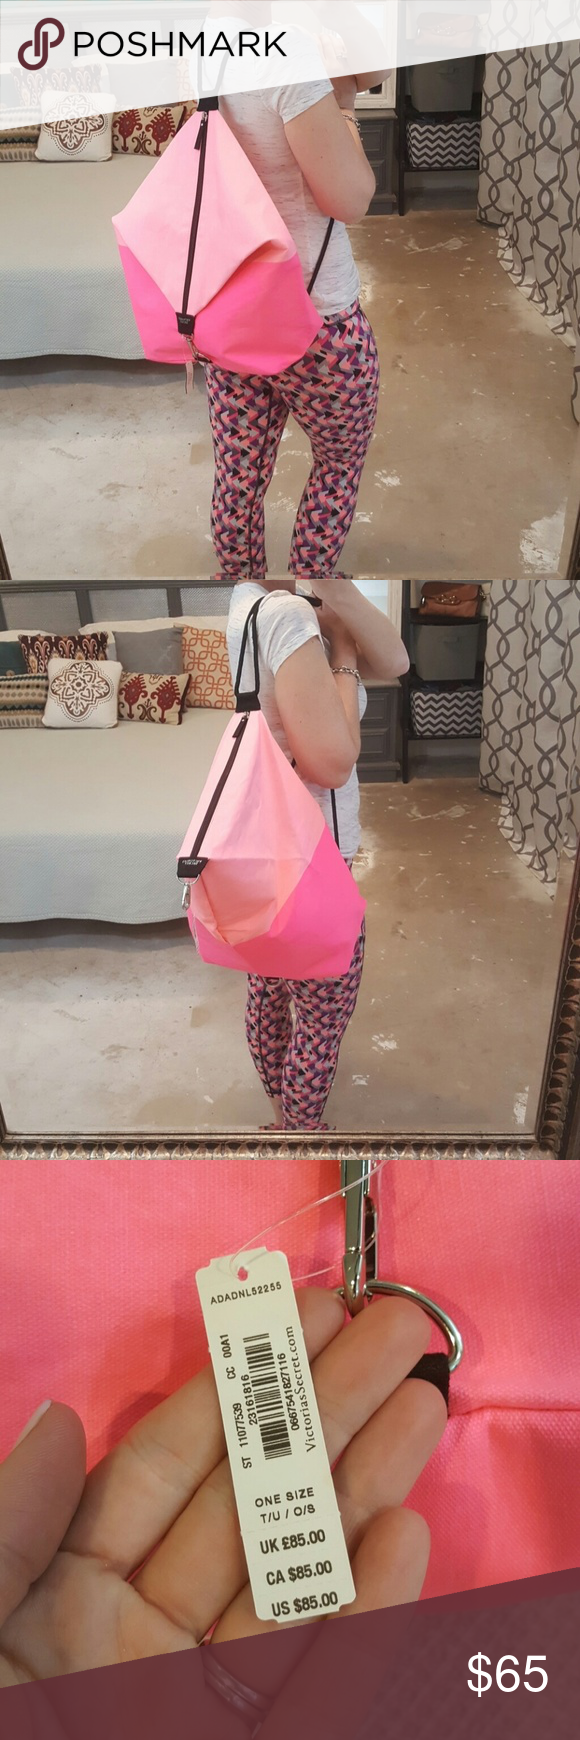 Victoria Secret Gym Bags Uk   ReGreen Springfield 022110424e